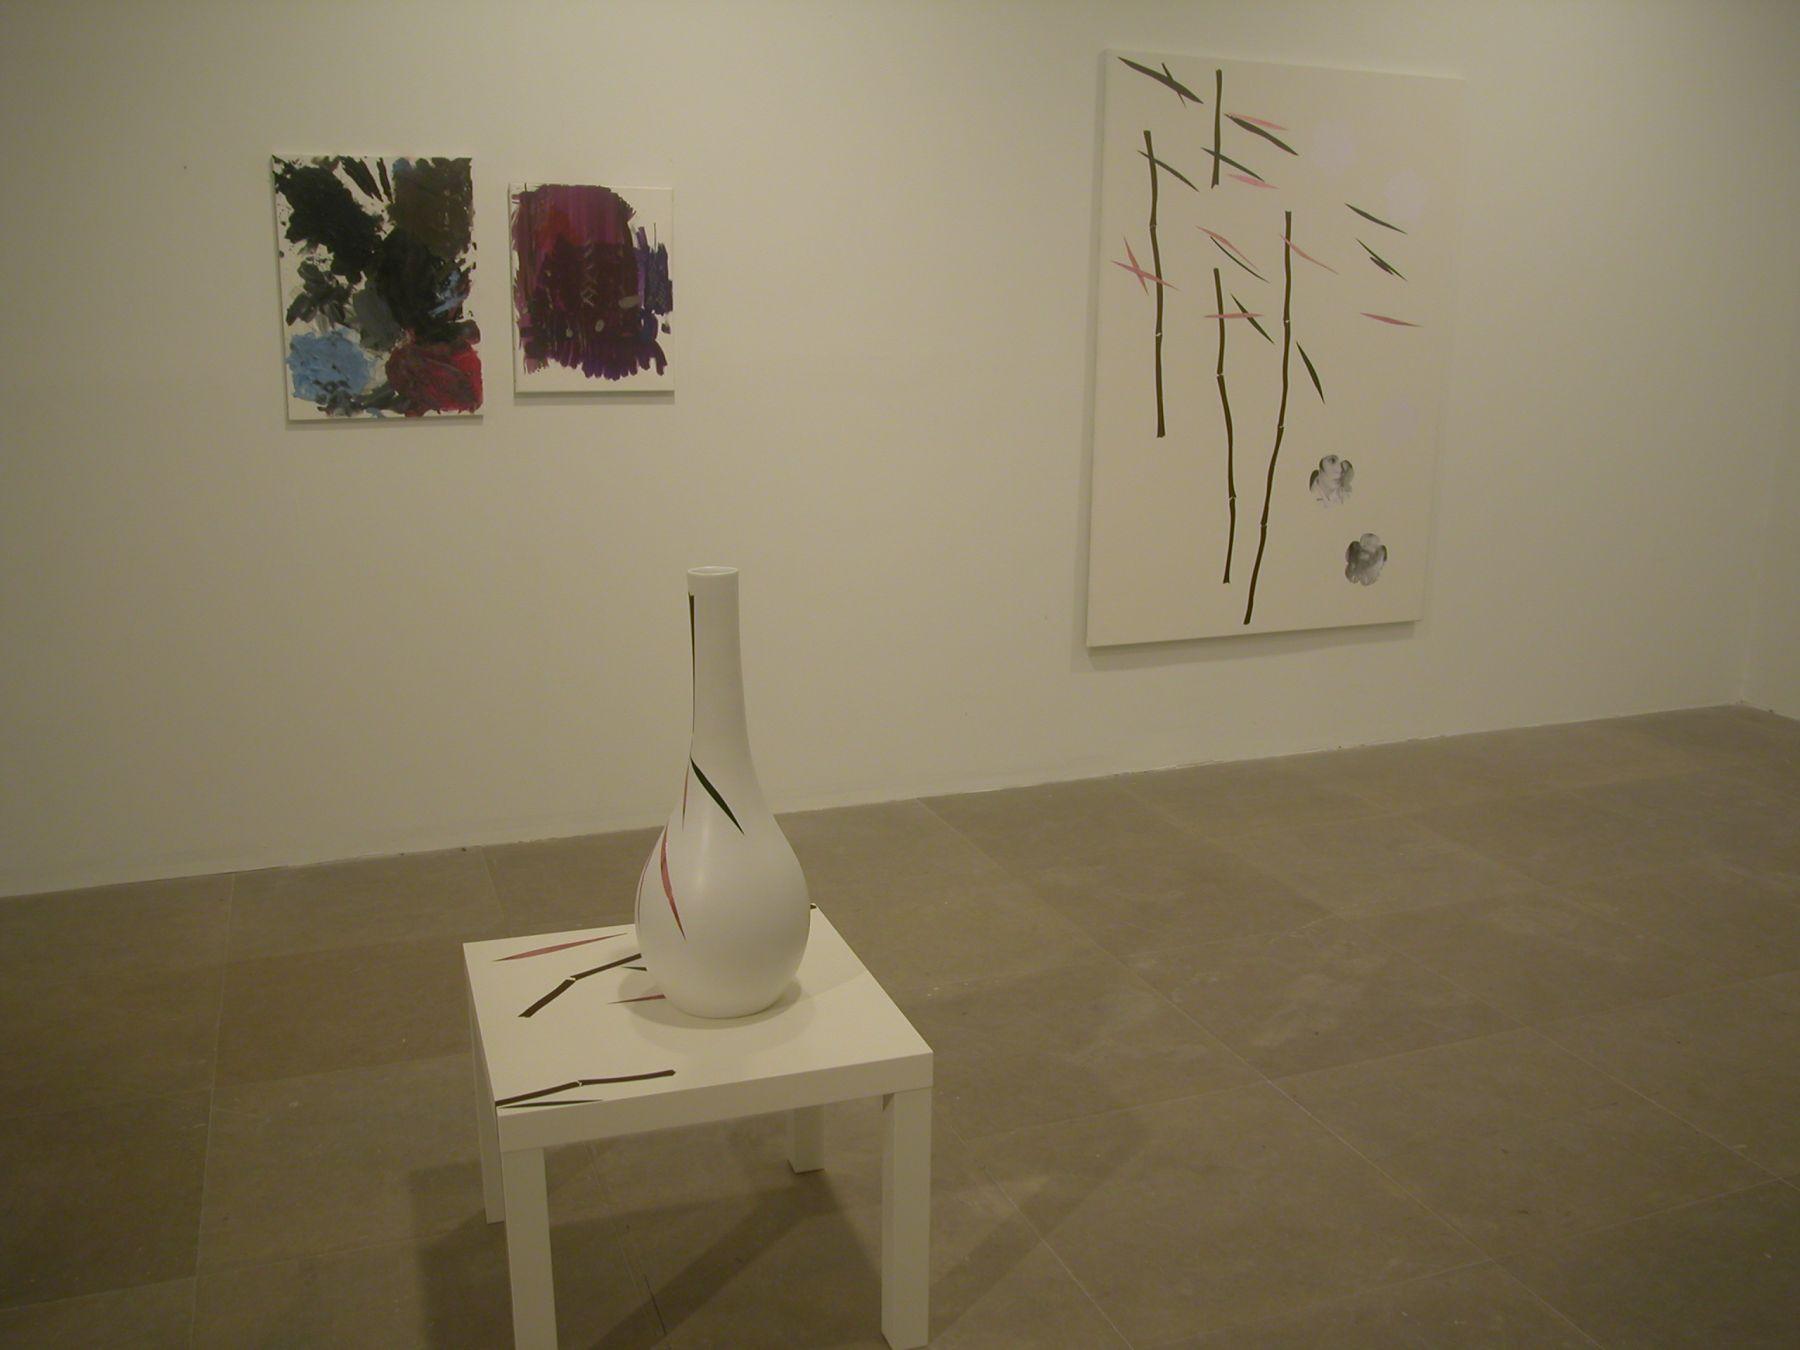 Installation view, POST MoDERN,  Greene Naftali, New York, 2005